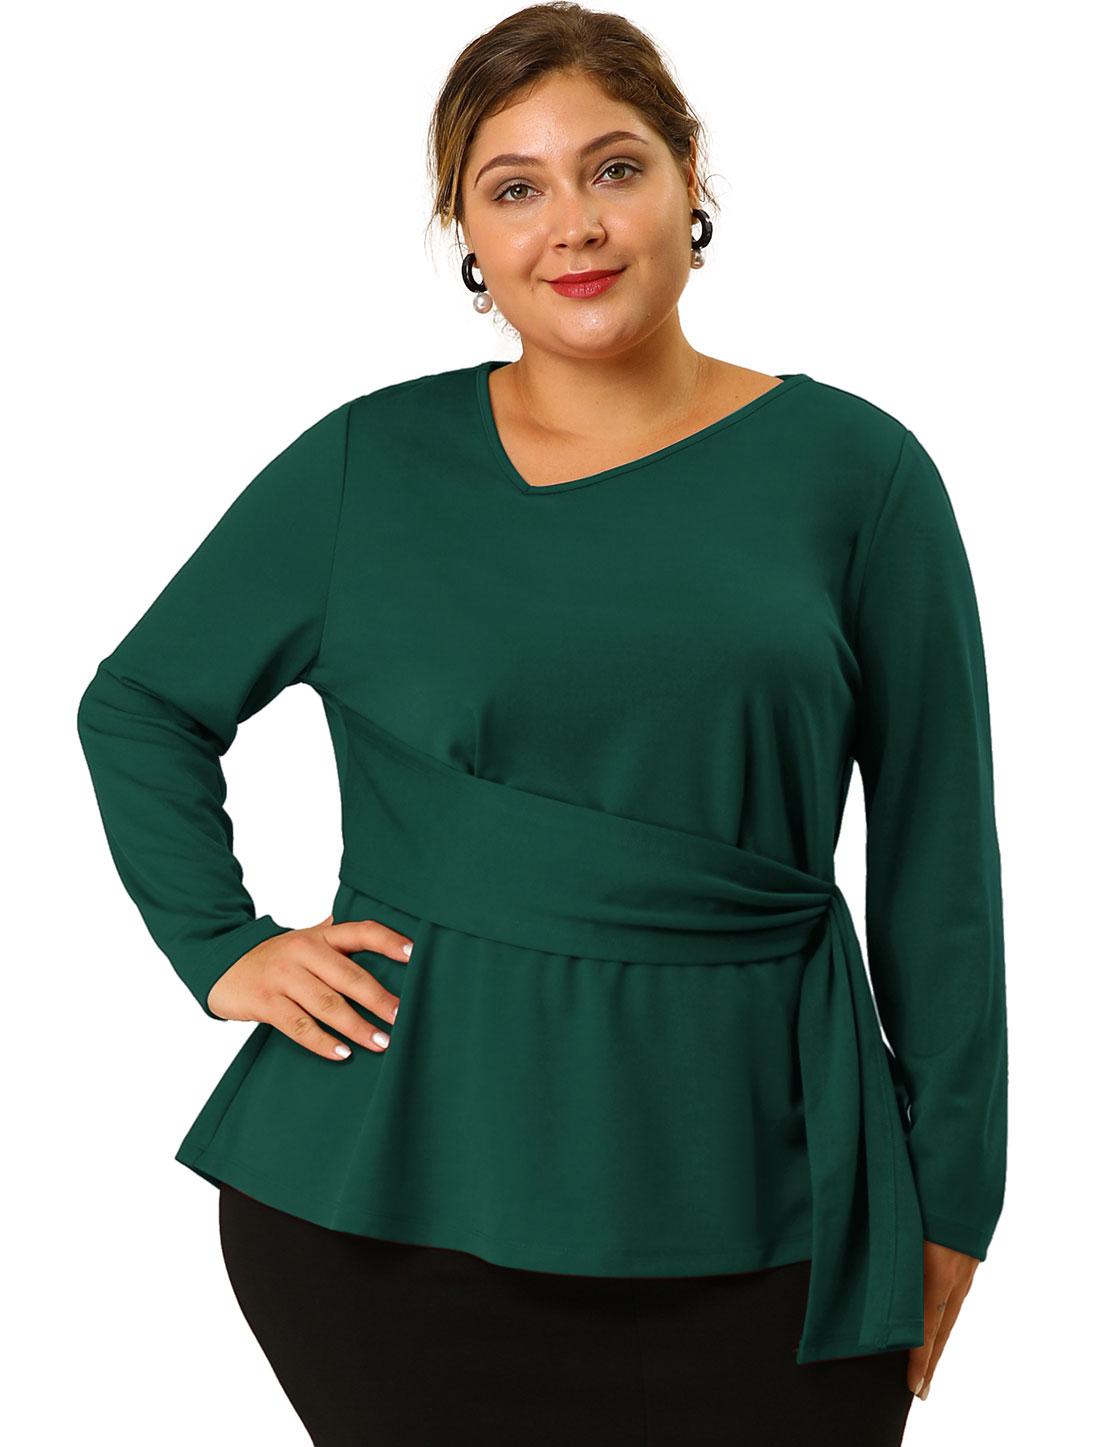 Women's Plus Size V Neck Belt Tie Blouse Long Sleeve Peplum Top Dark Green 3X